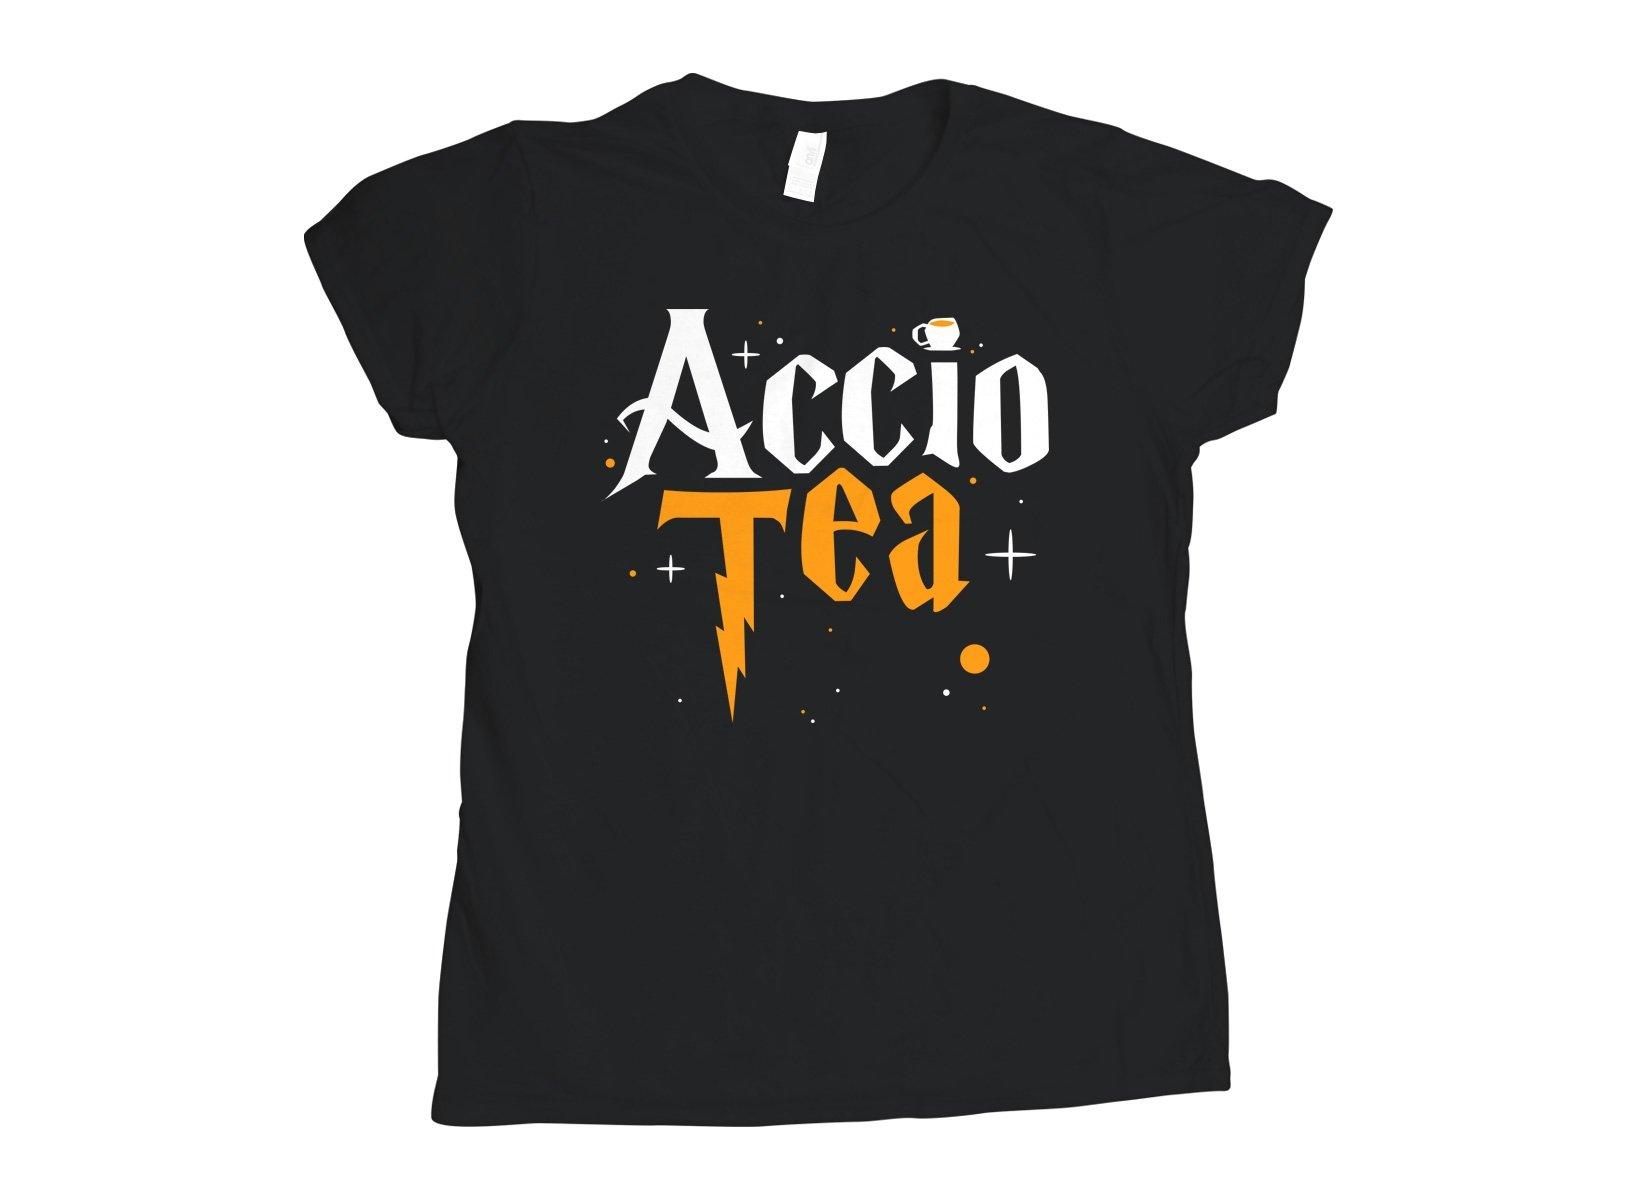 Accio Tea on Womens T-Shirt